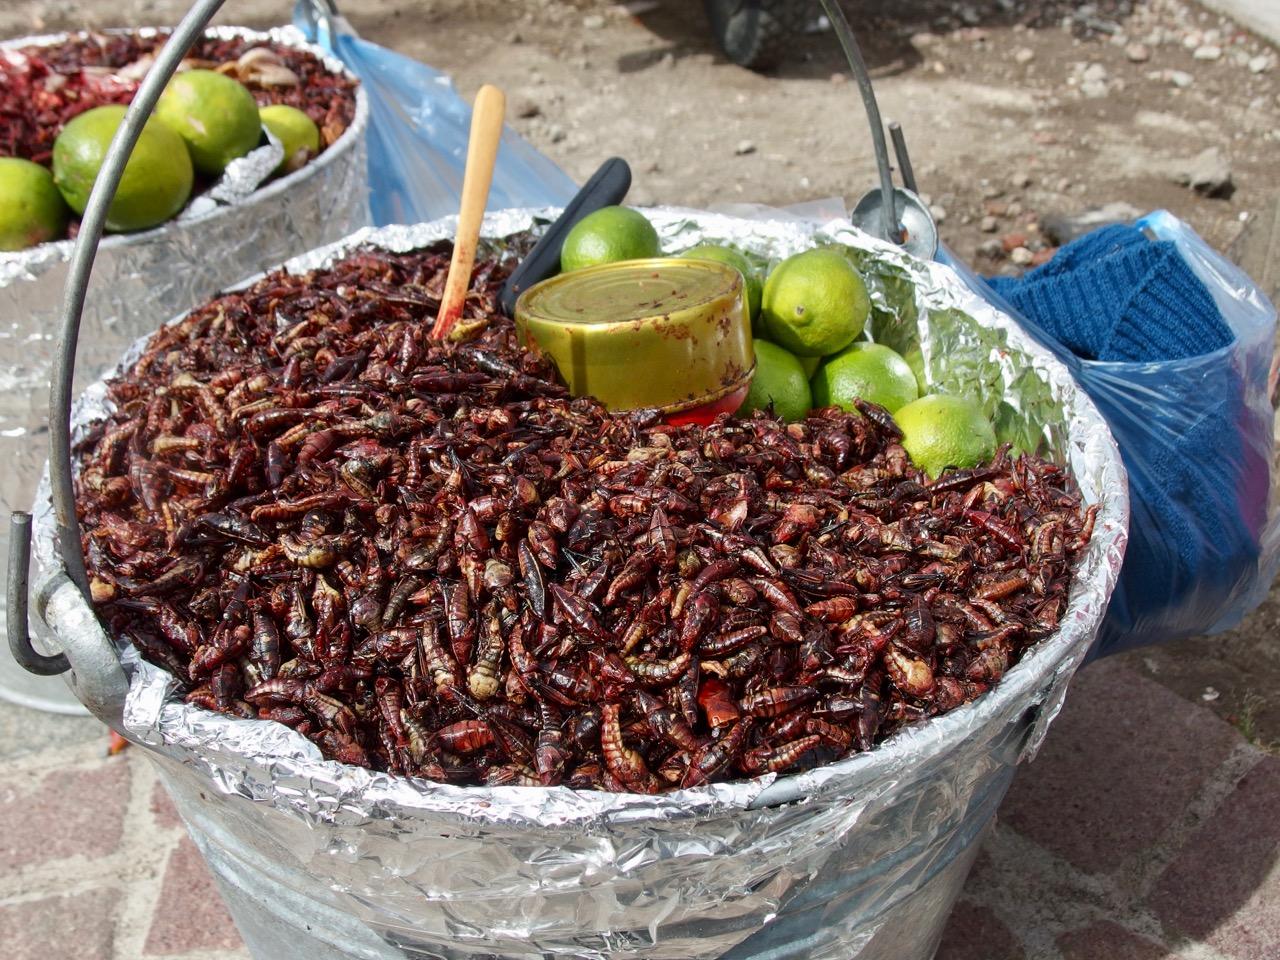 Grasshoppers, Cholula, Mexico